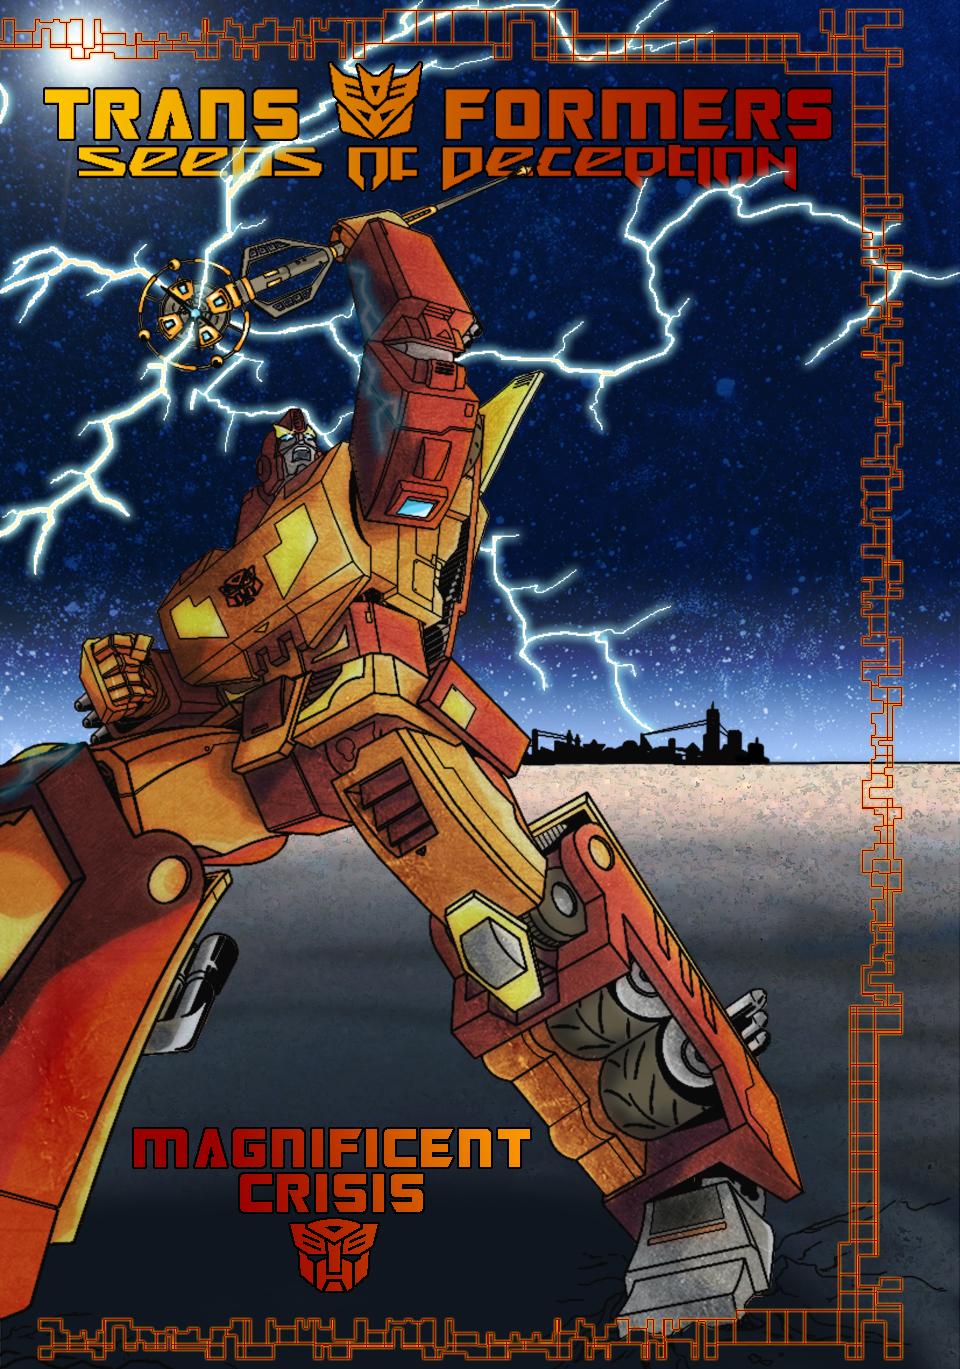 Magnificent Crisis - cover B